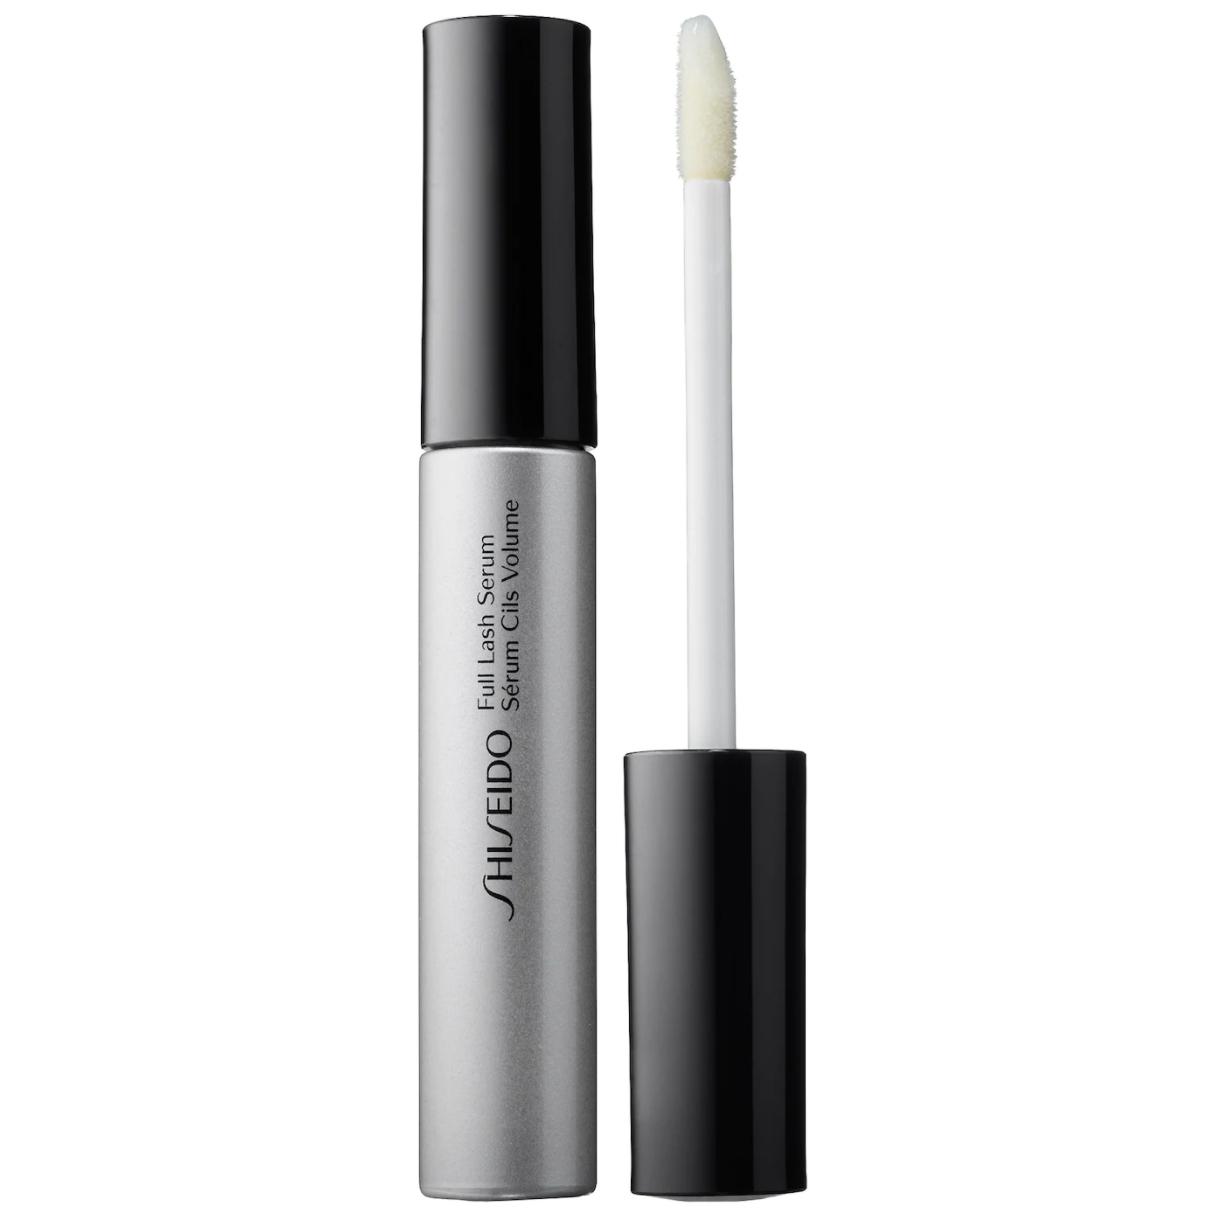 best eyelash growth serums shiseido